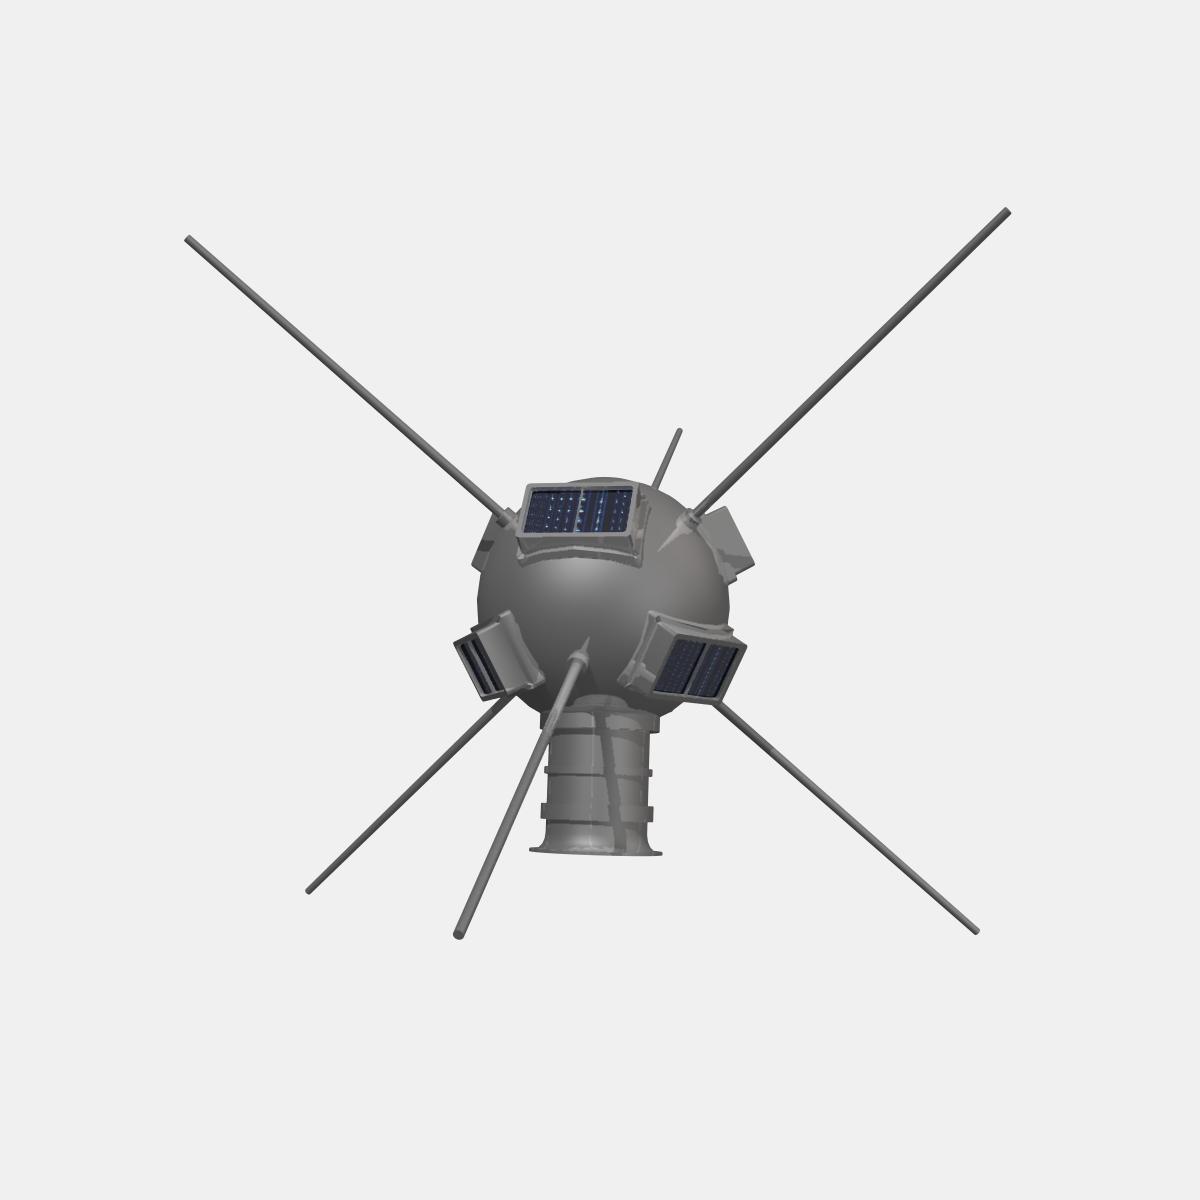 vanguard i satellite 3d model 3ds dxf fbx blend cob dae x obj 163929